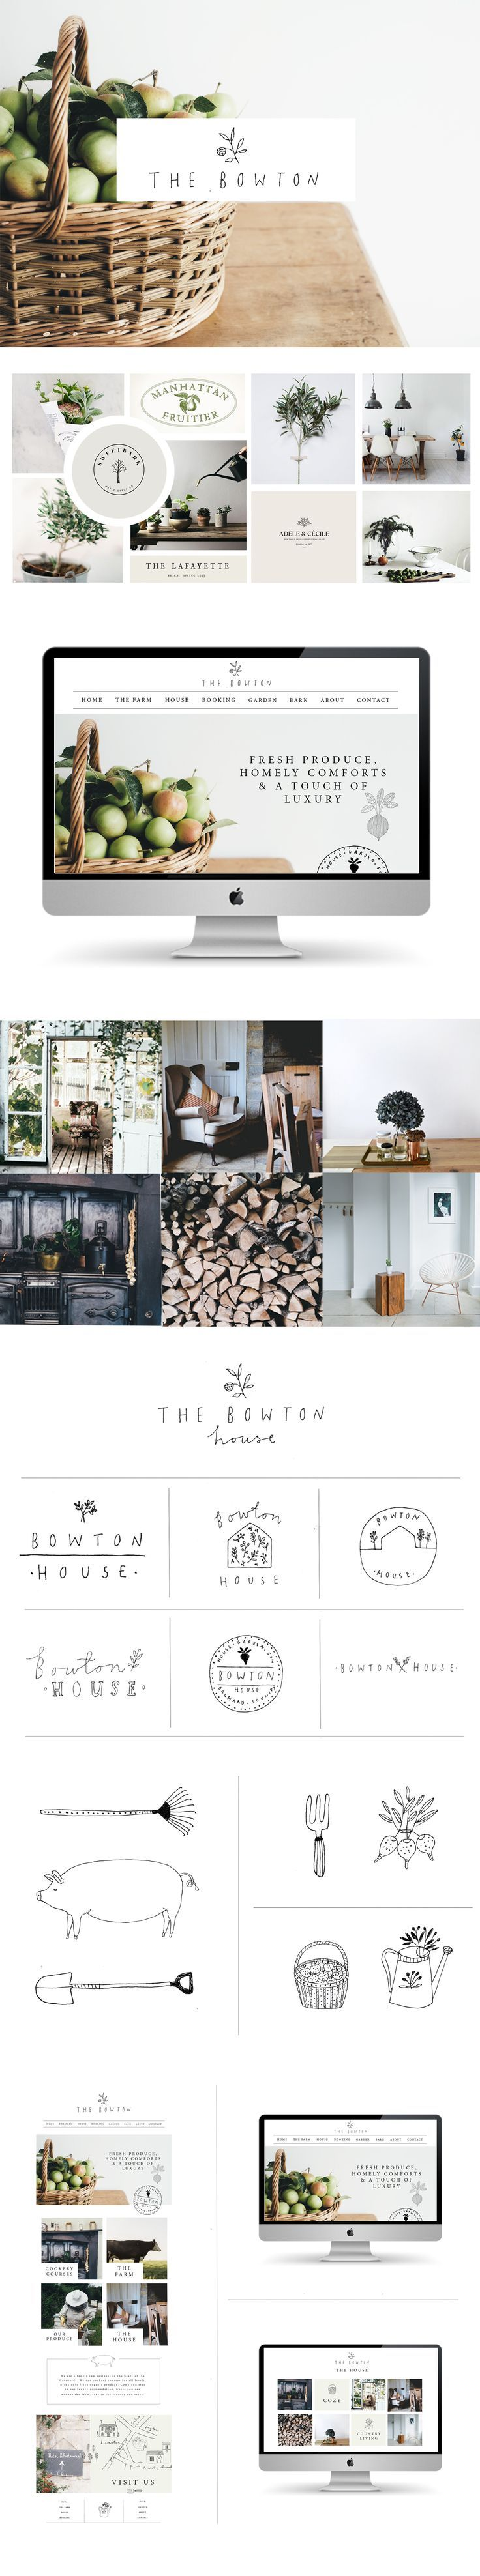 Website and branding by Ryn Frank